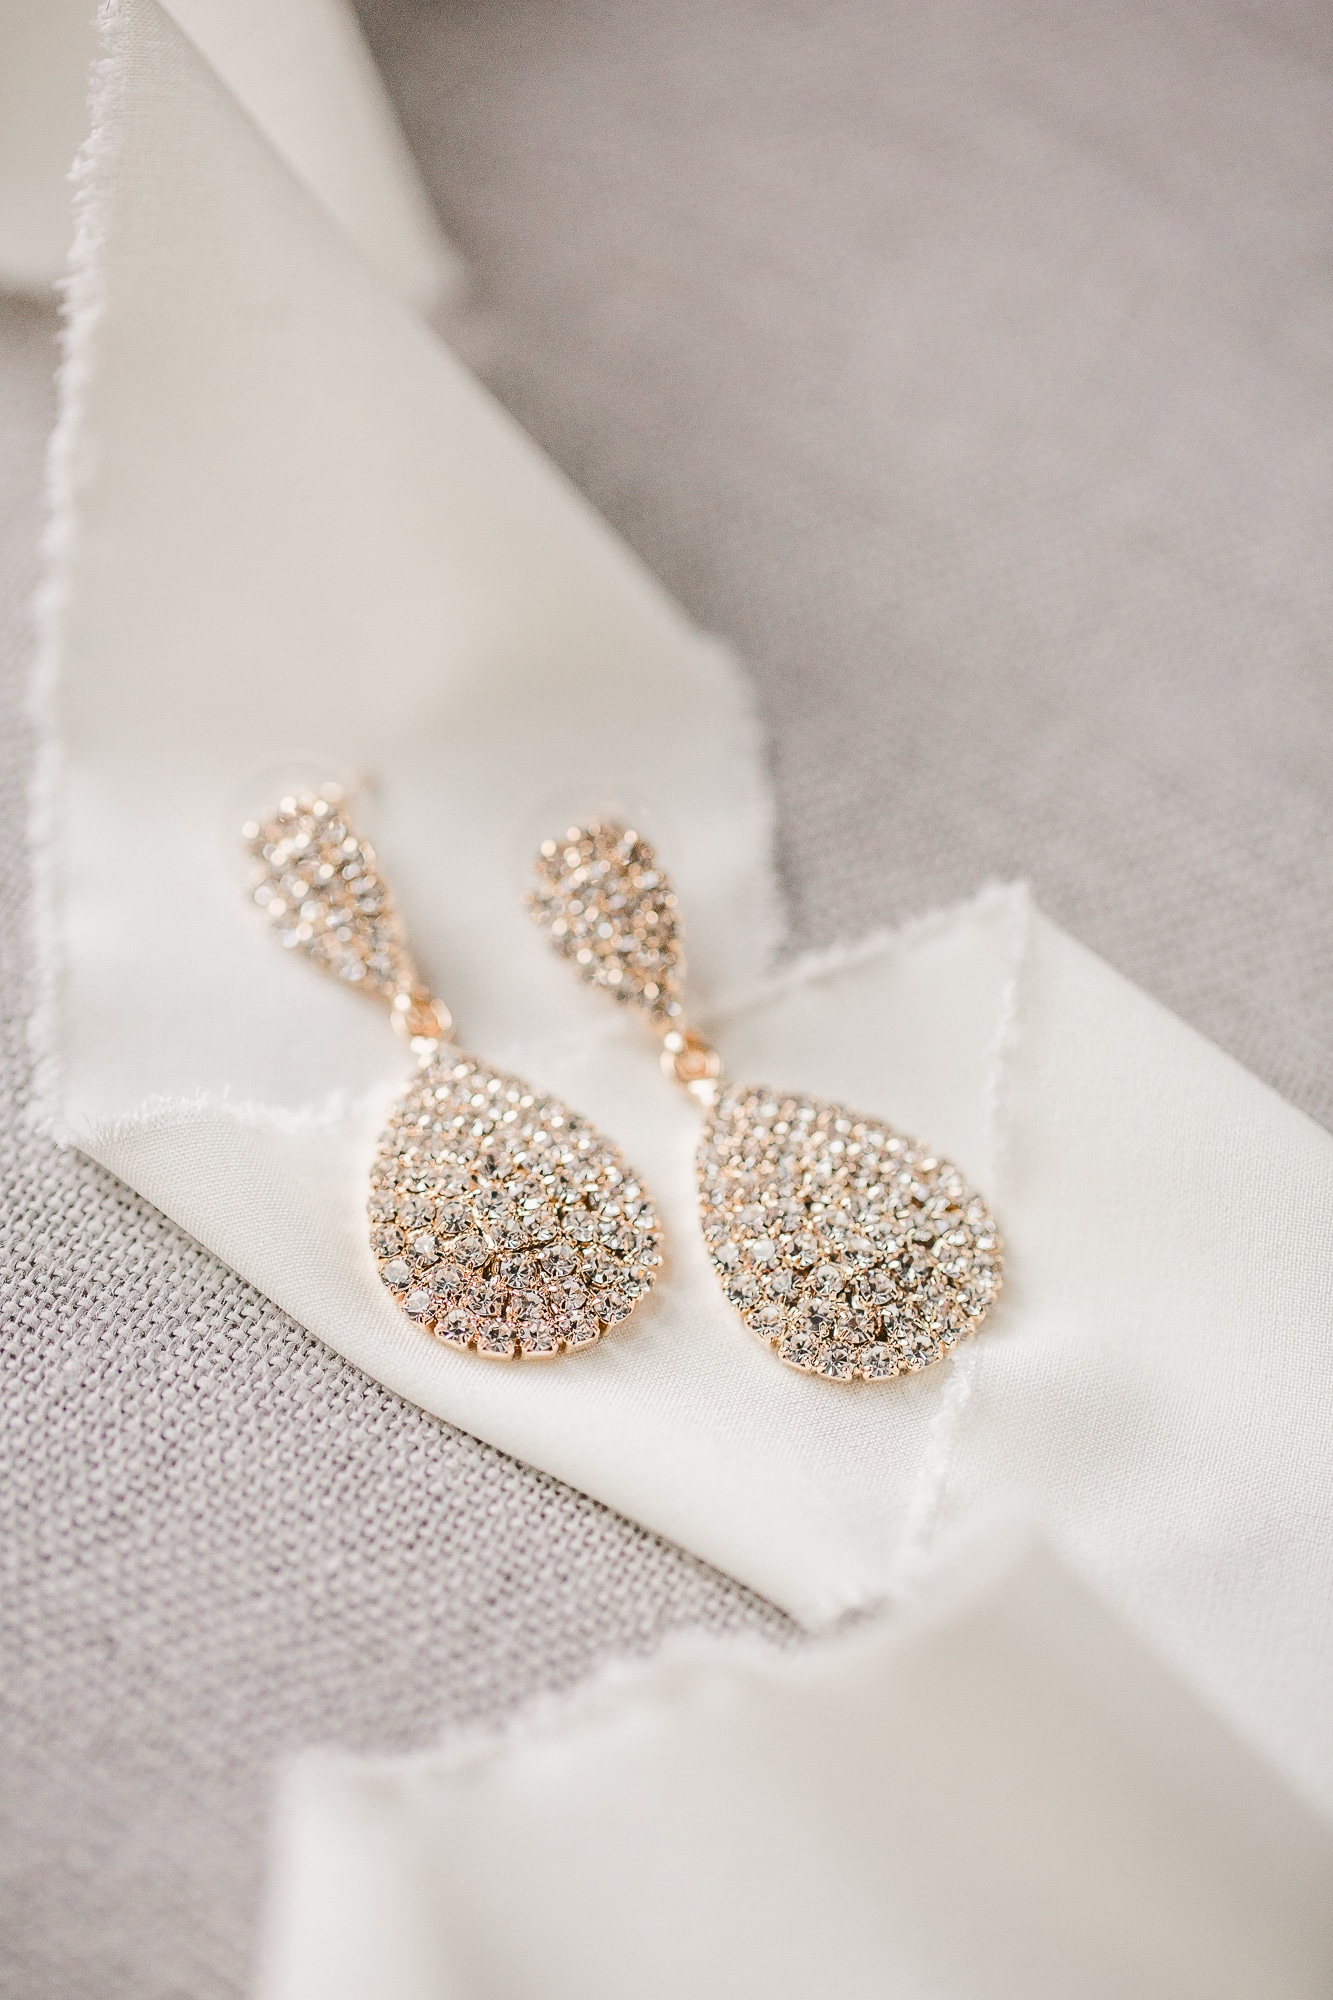 Dangling Bridal Earrings   Nashville Bride Guide